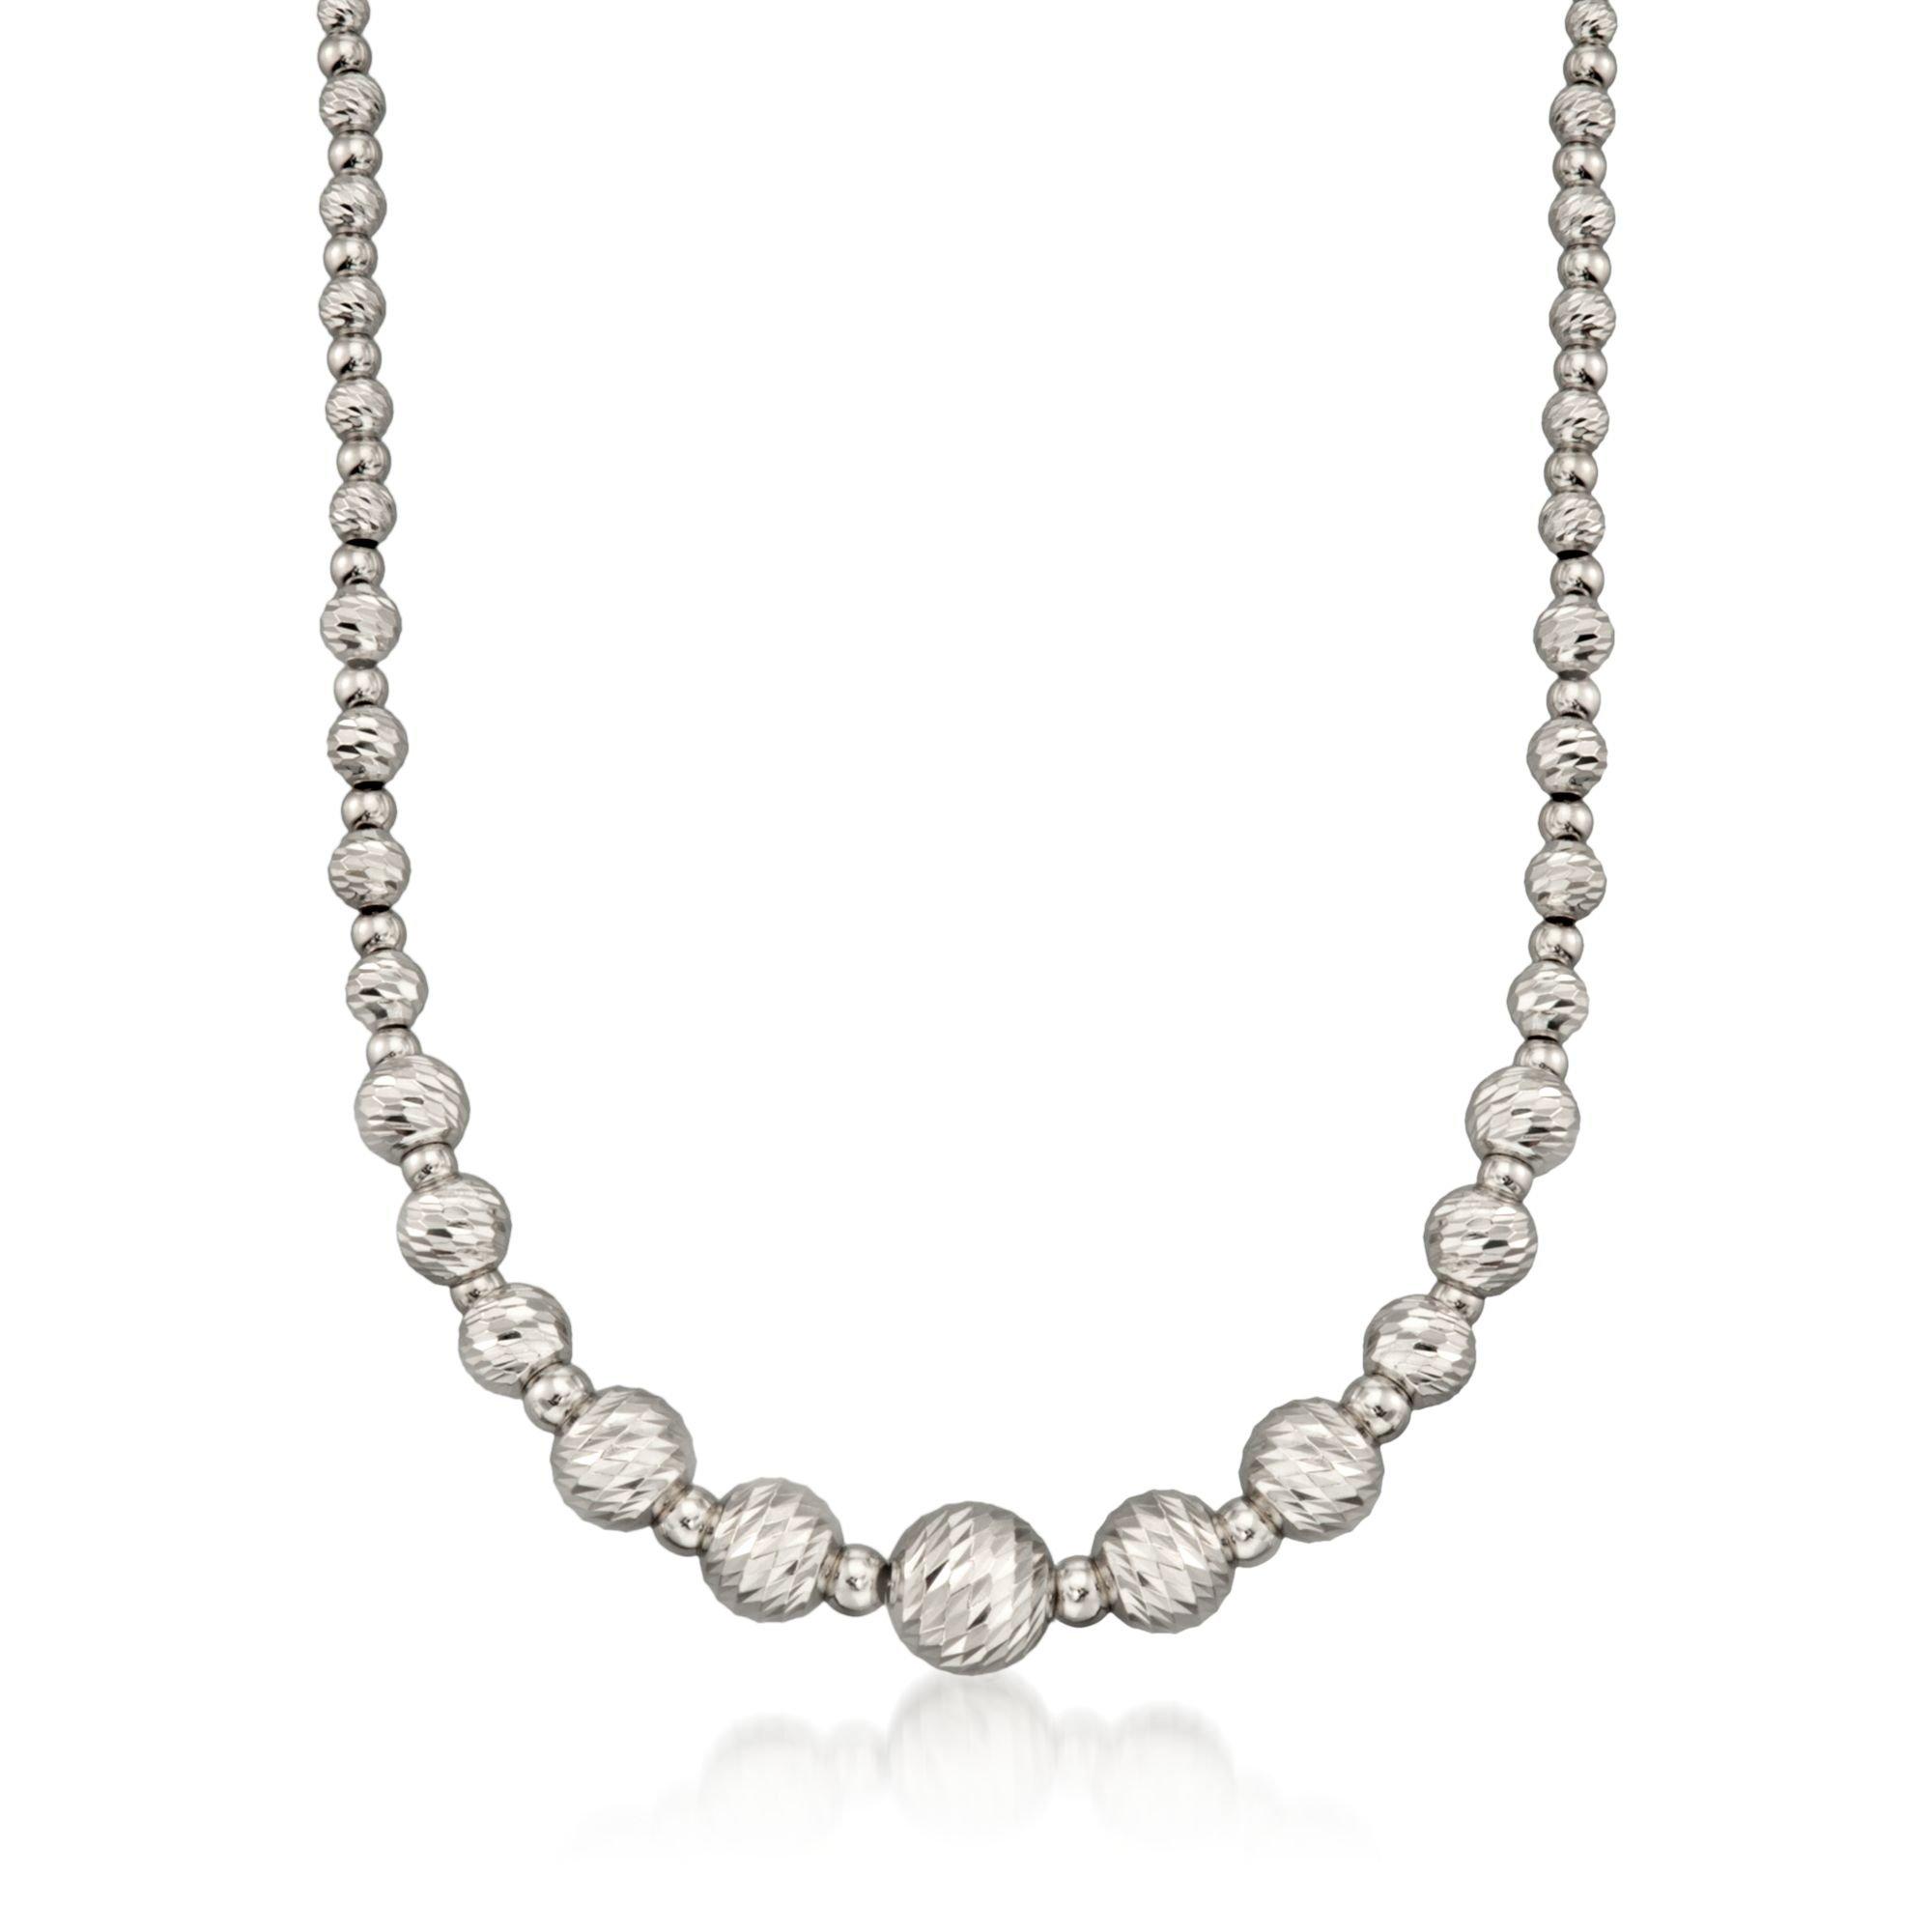 Ross-Simons Italian Sterling Silver Diamond-Cut Bead Necklace